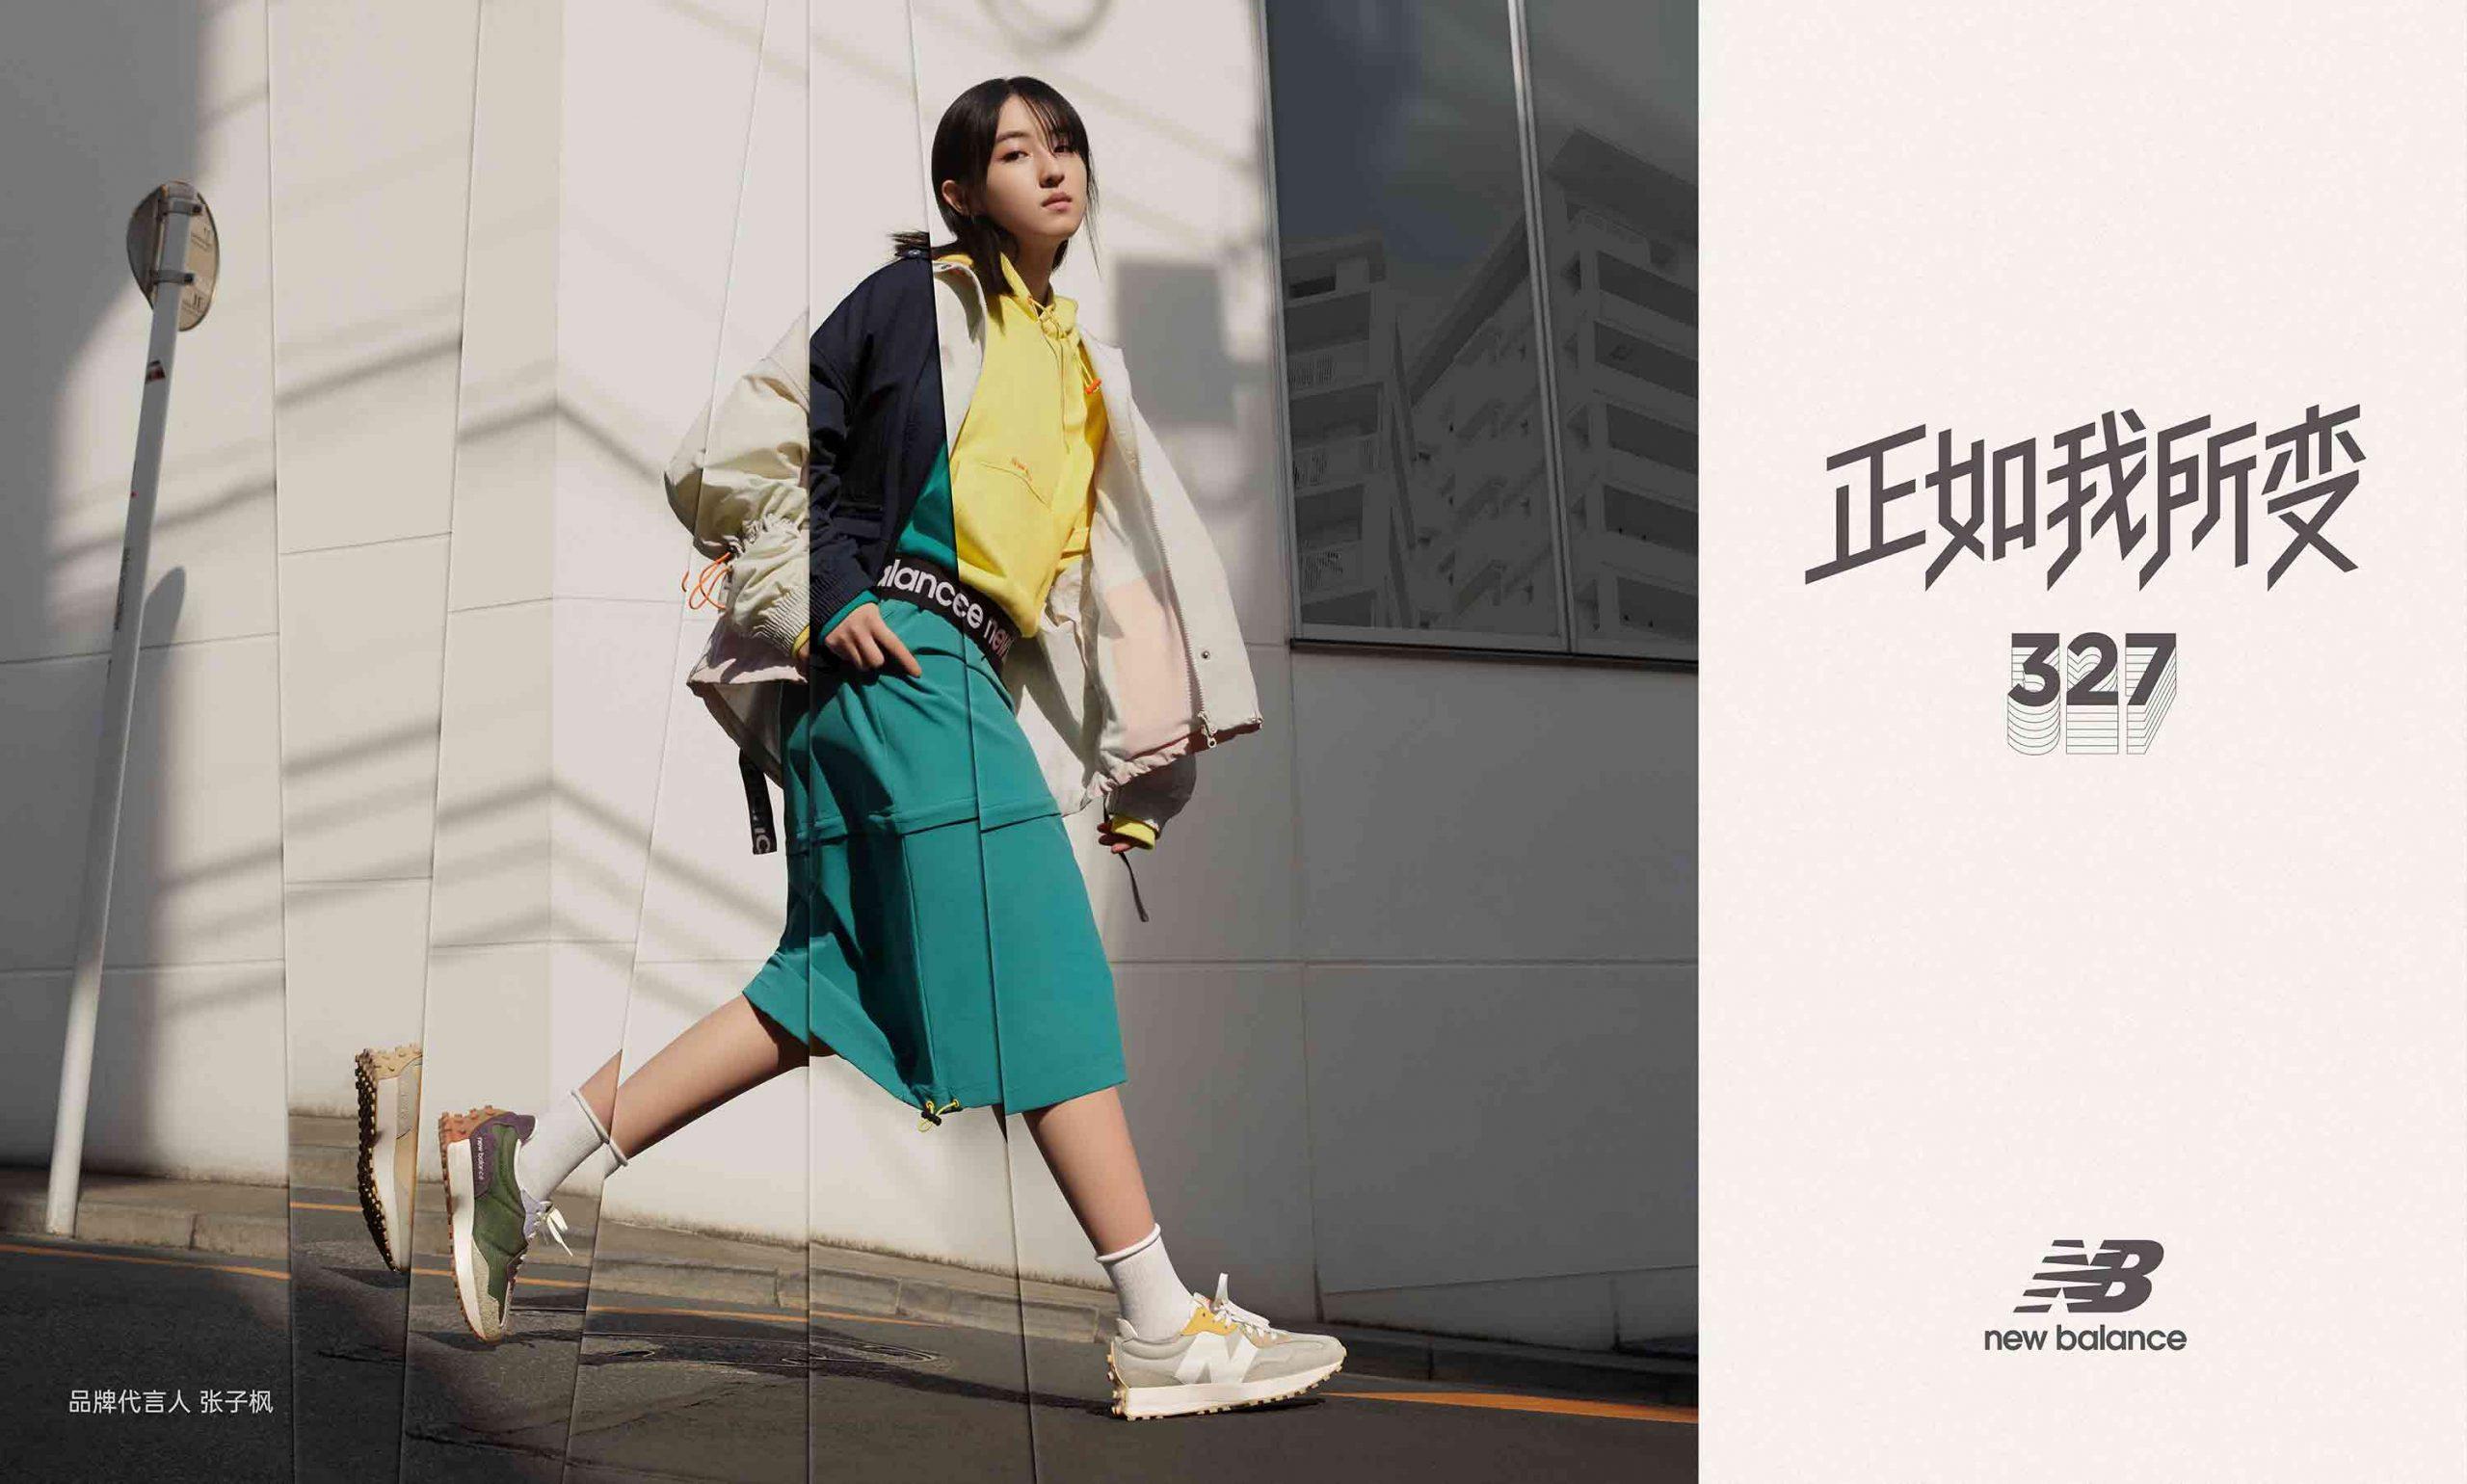 New Balance 携手张子枫推出全新 Energy Pack 服装系列